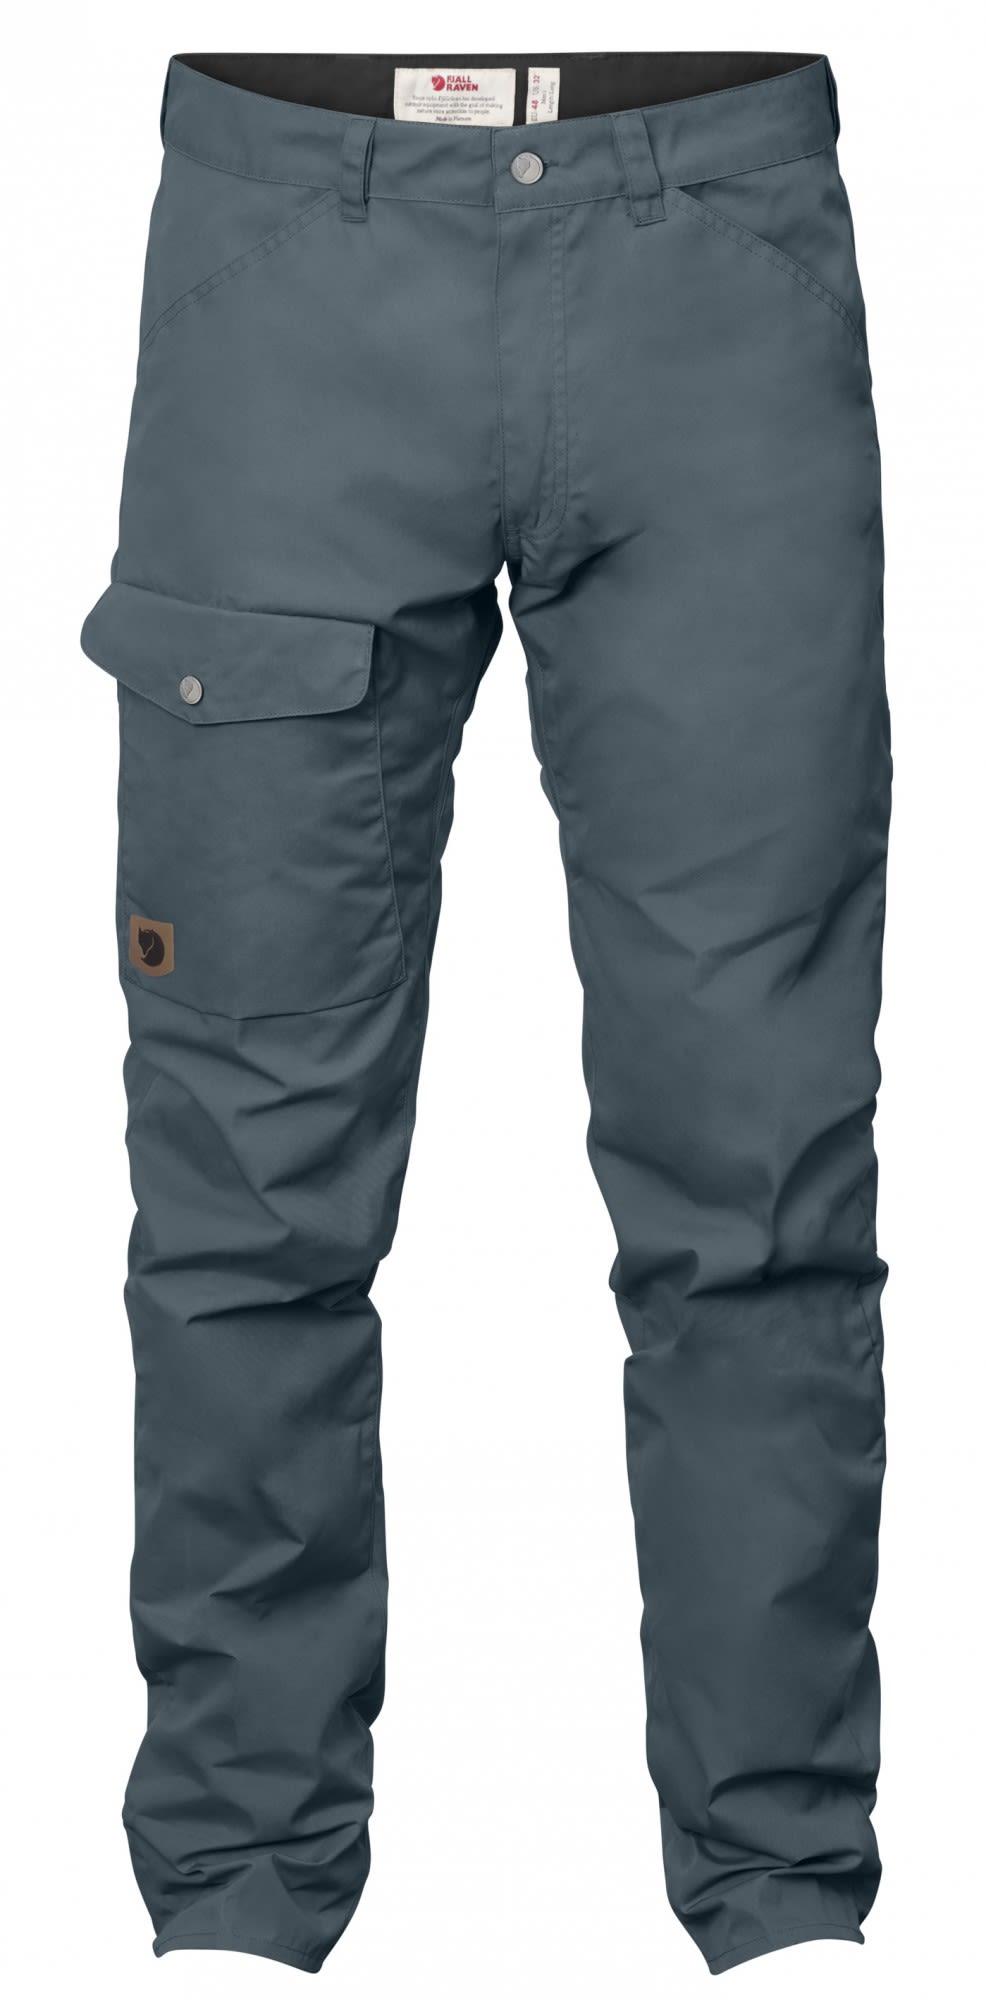 Fjällräven Greenland Jeans Long Blau, Male G-1000® 50 -Farbe Dusk, 50